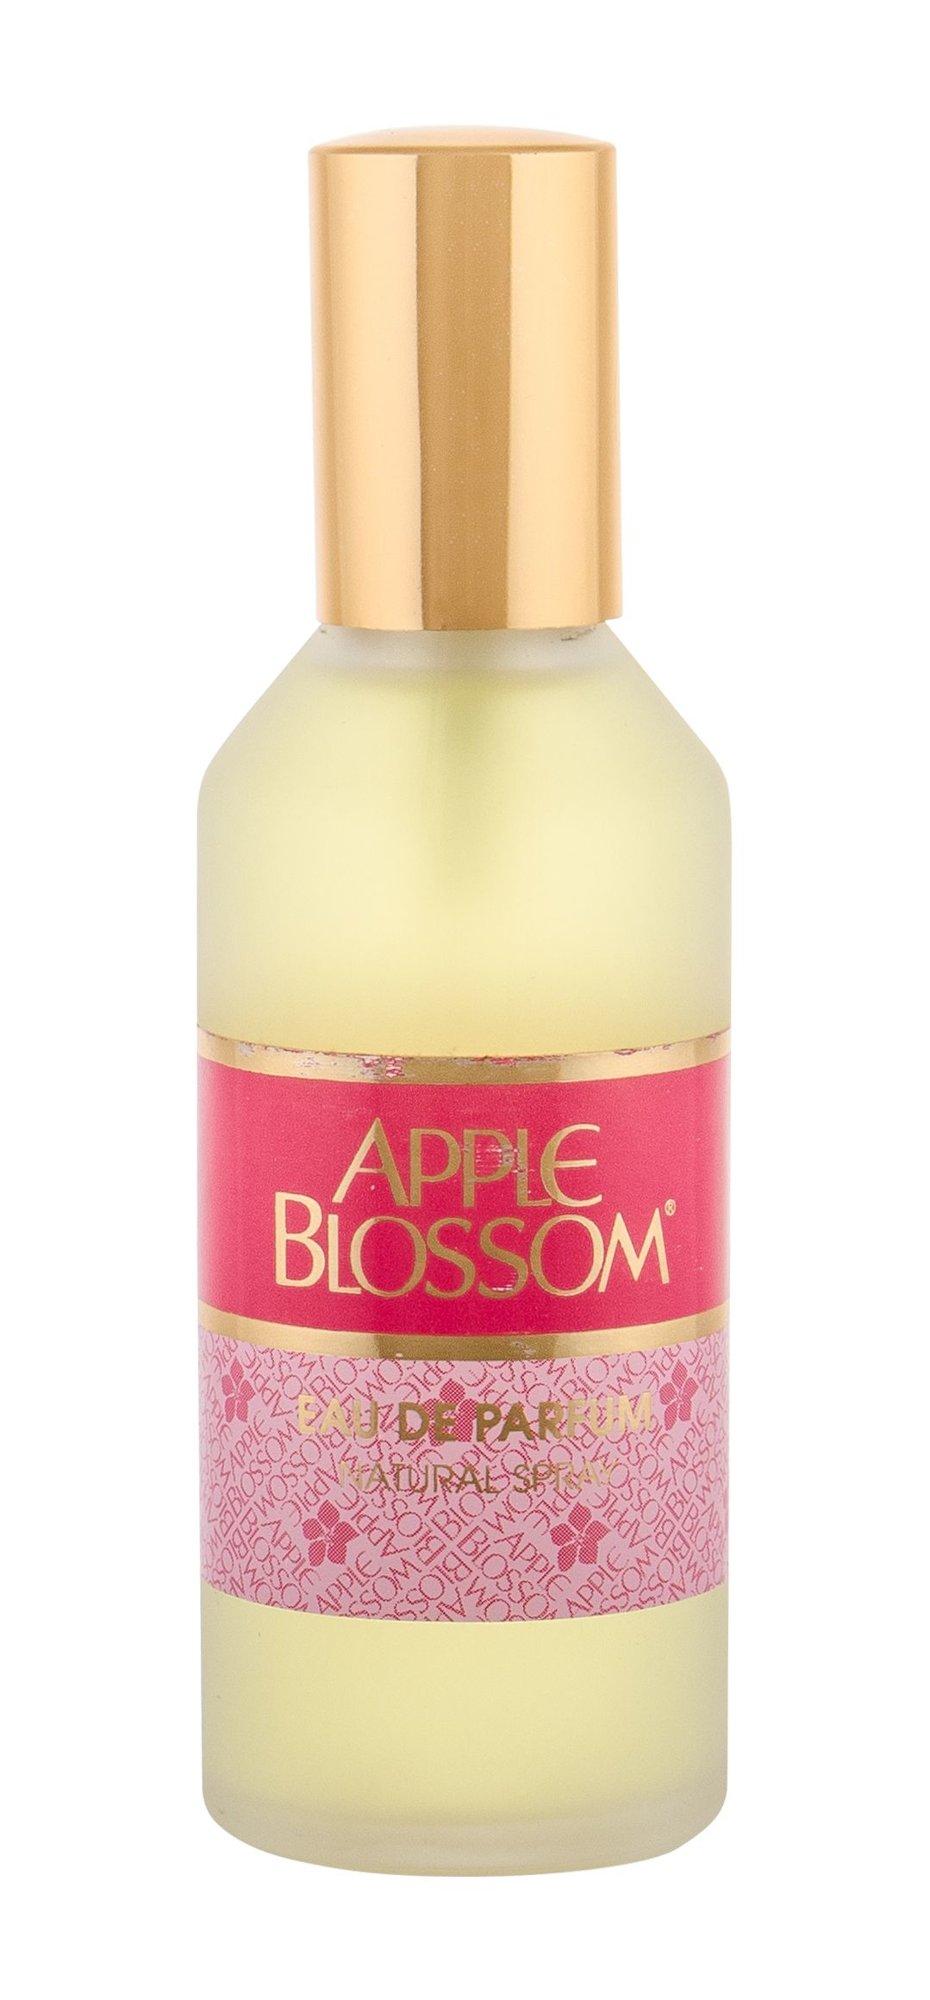 Kent Cosmetics Limited Apple Blossom